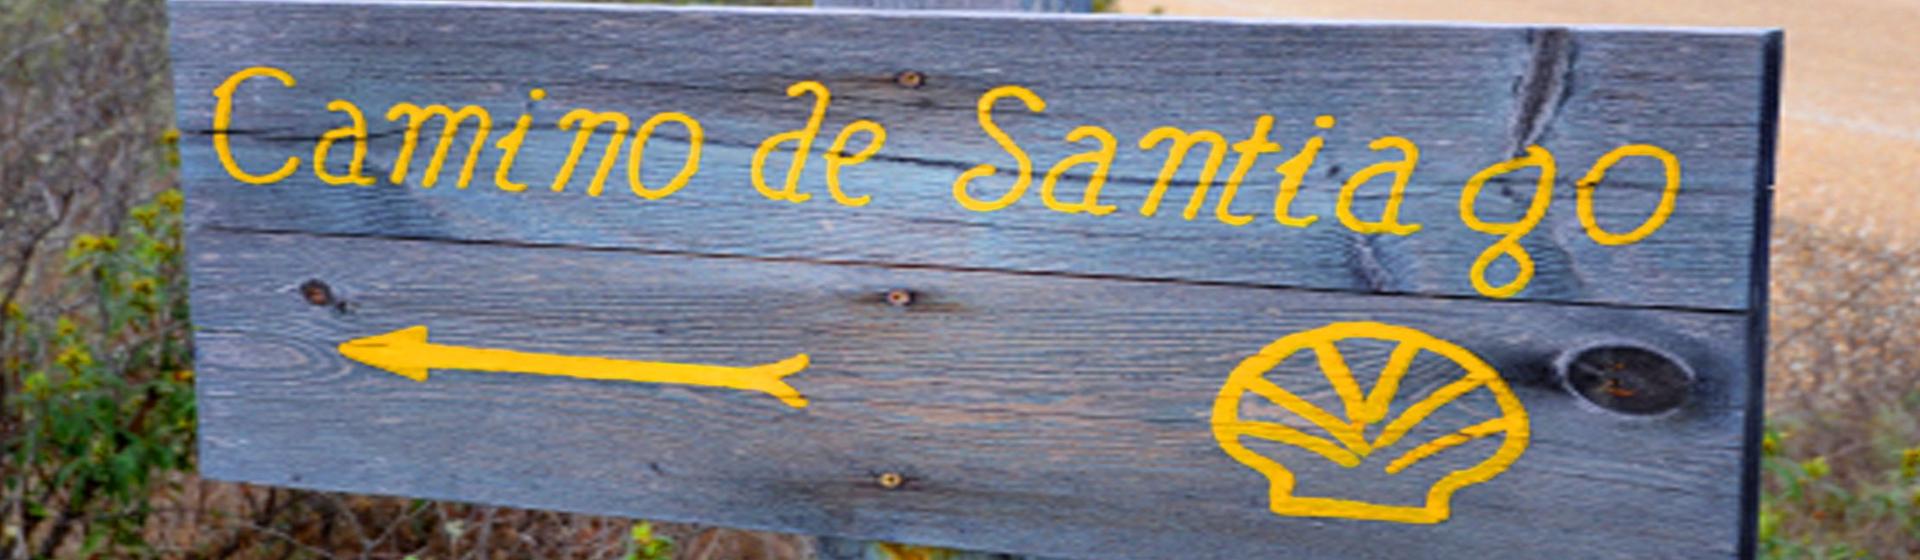 Camino de Santiago. Camino de Santiago portugués, primitivo, inglés, de la Plata, Camino de Santiago Francés